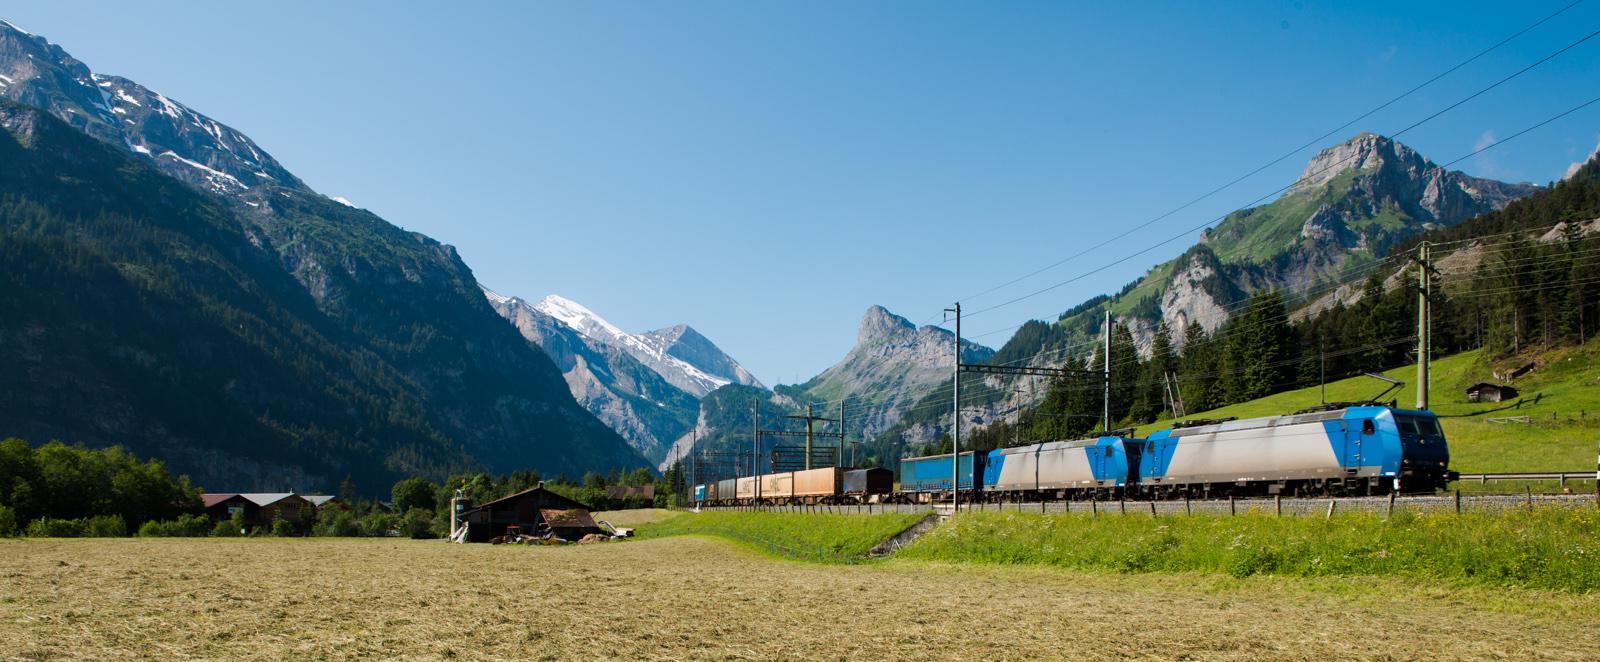 >> Up Train >>